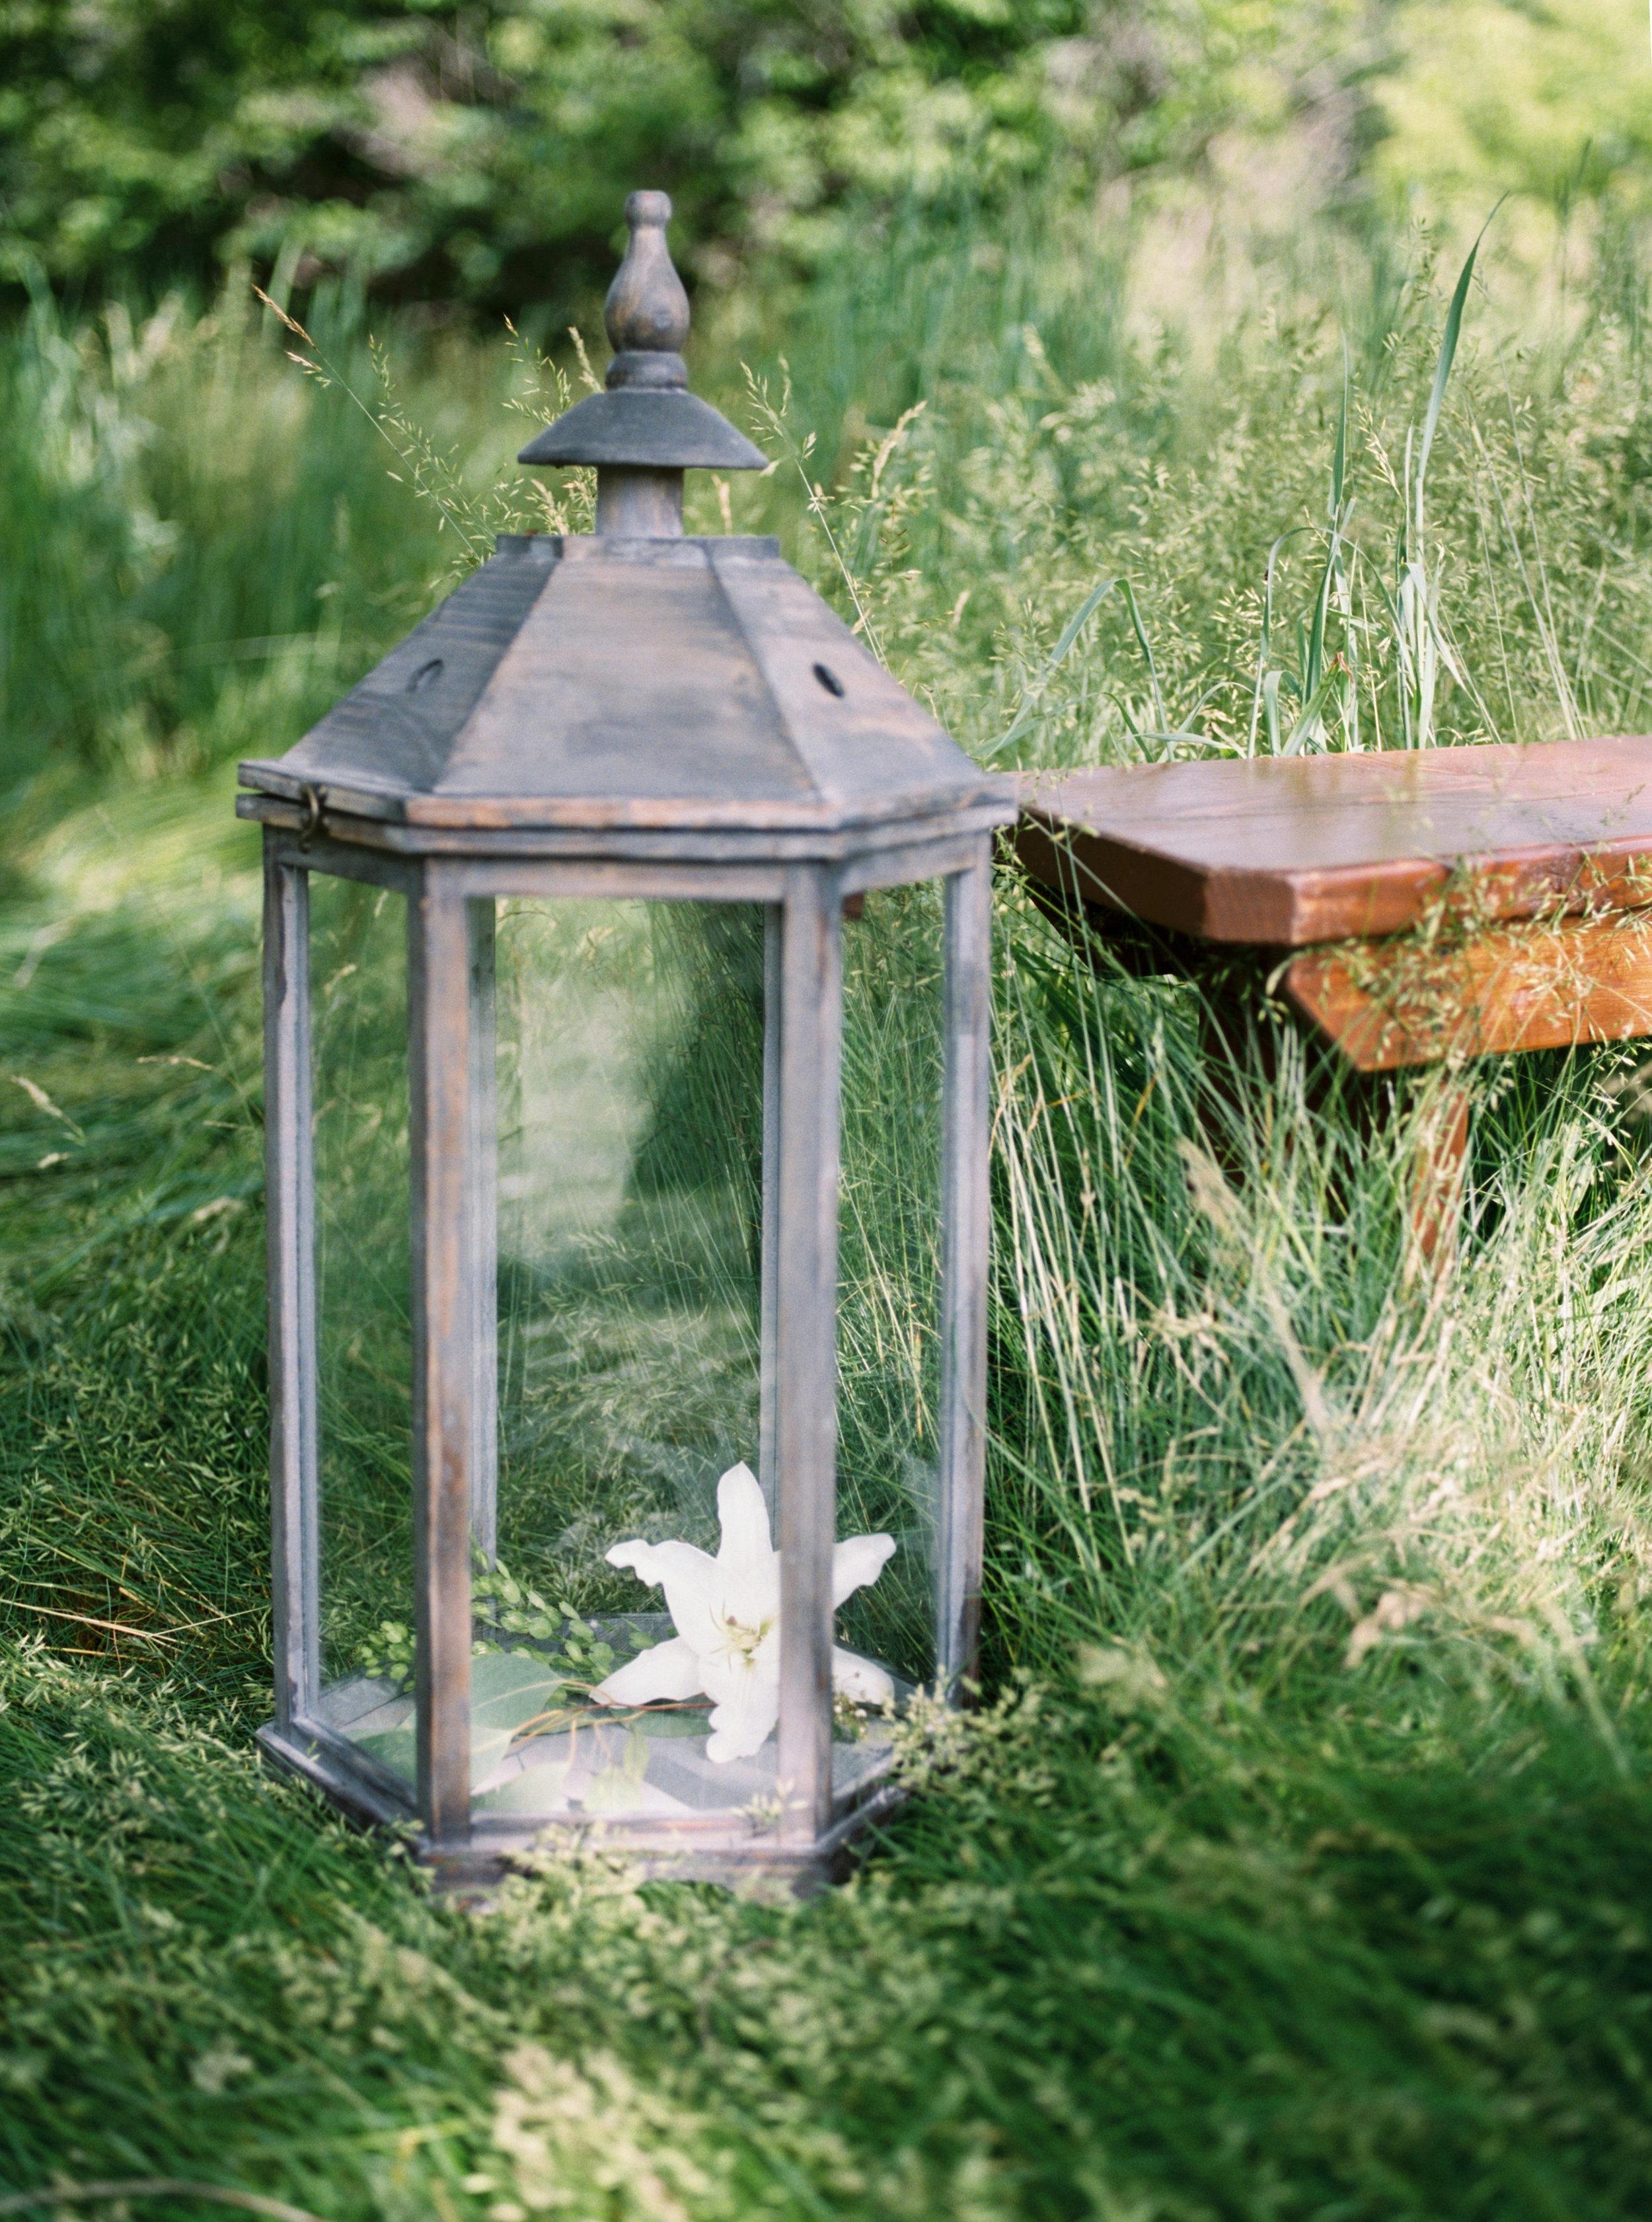 greenhouse-wedding-inspiration-by-laurelyn-savannah-photography-53.jpg